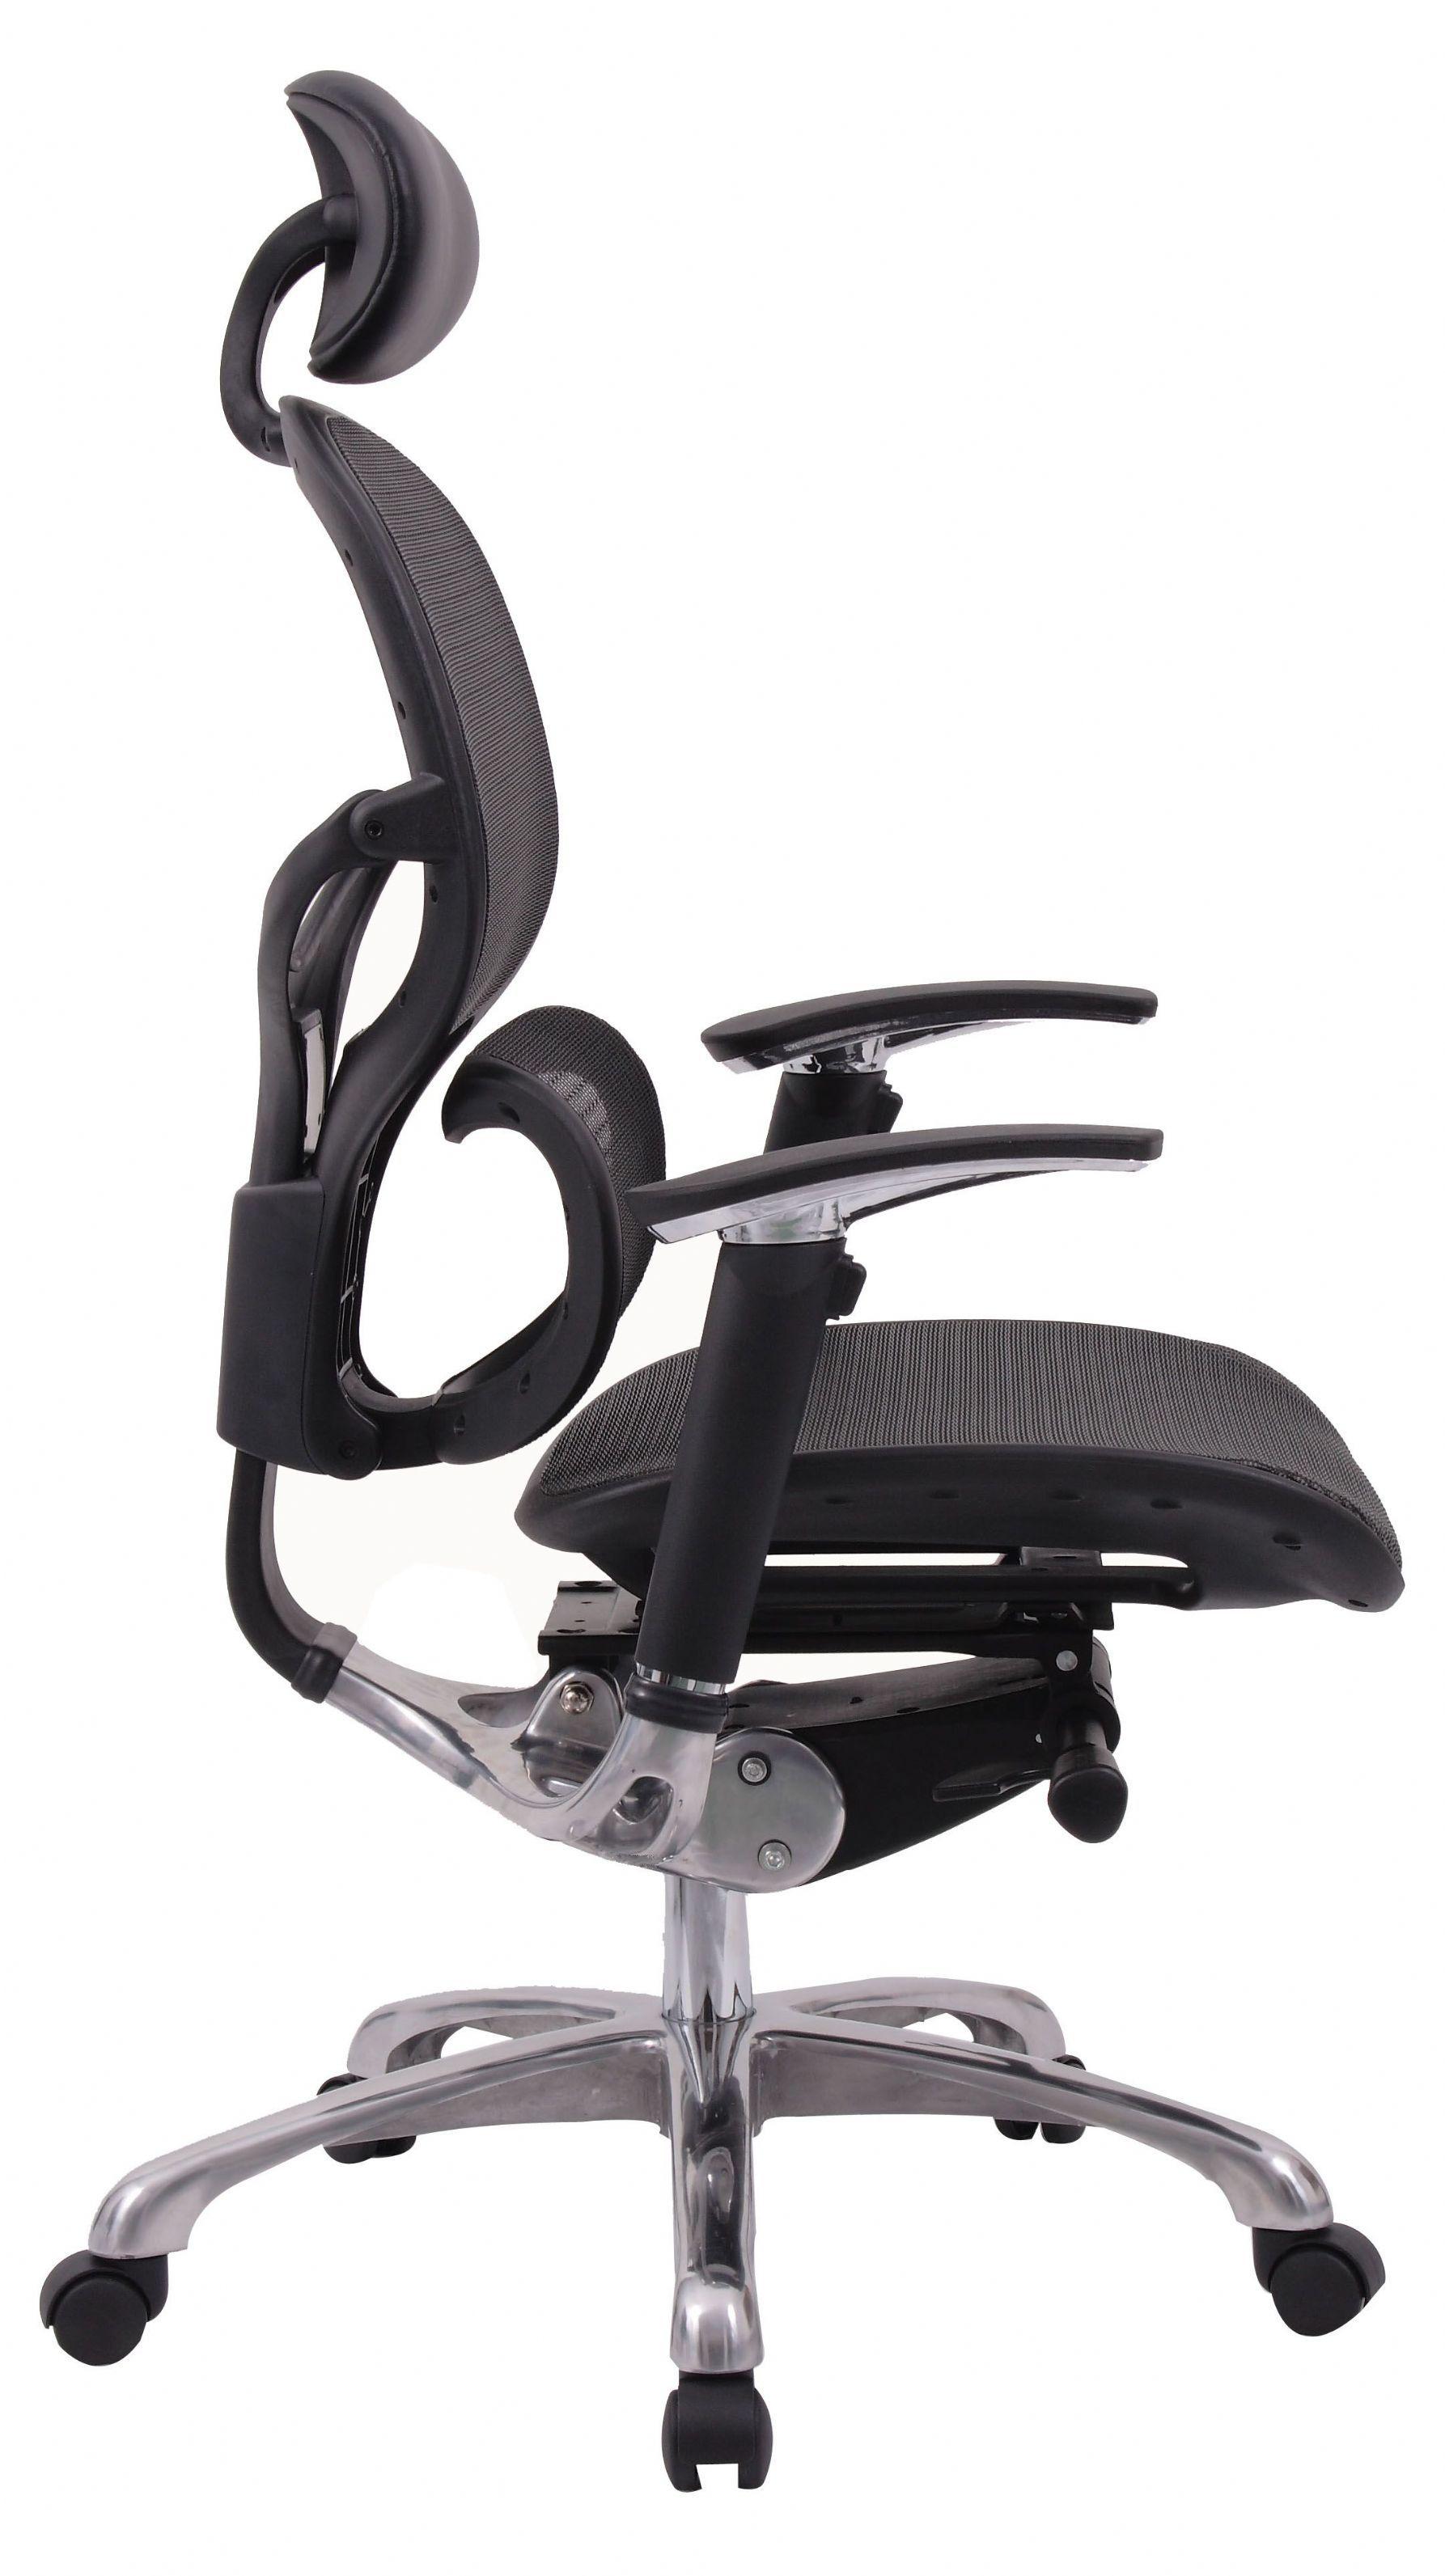 Ergonomic Office Chairs Ofwllc Com Best Office Chair Best